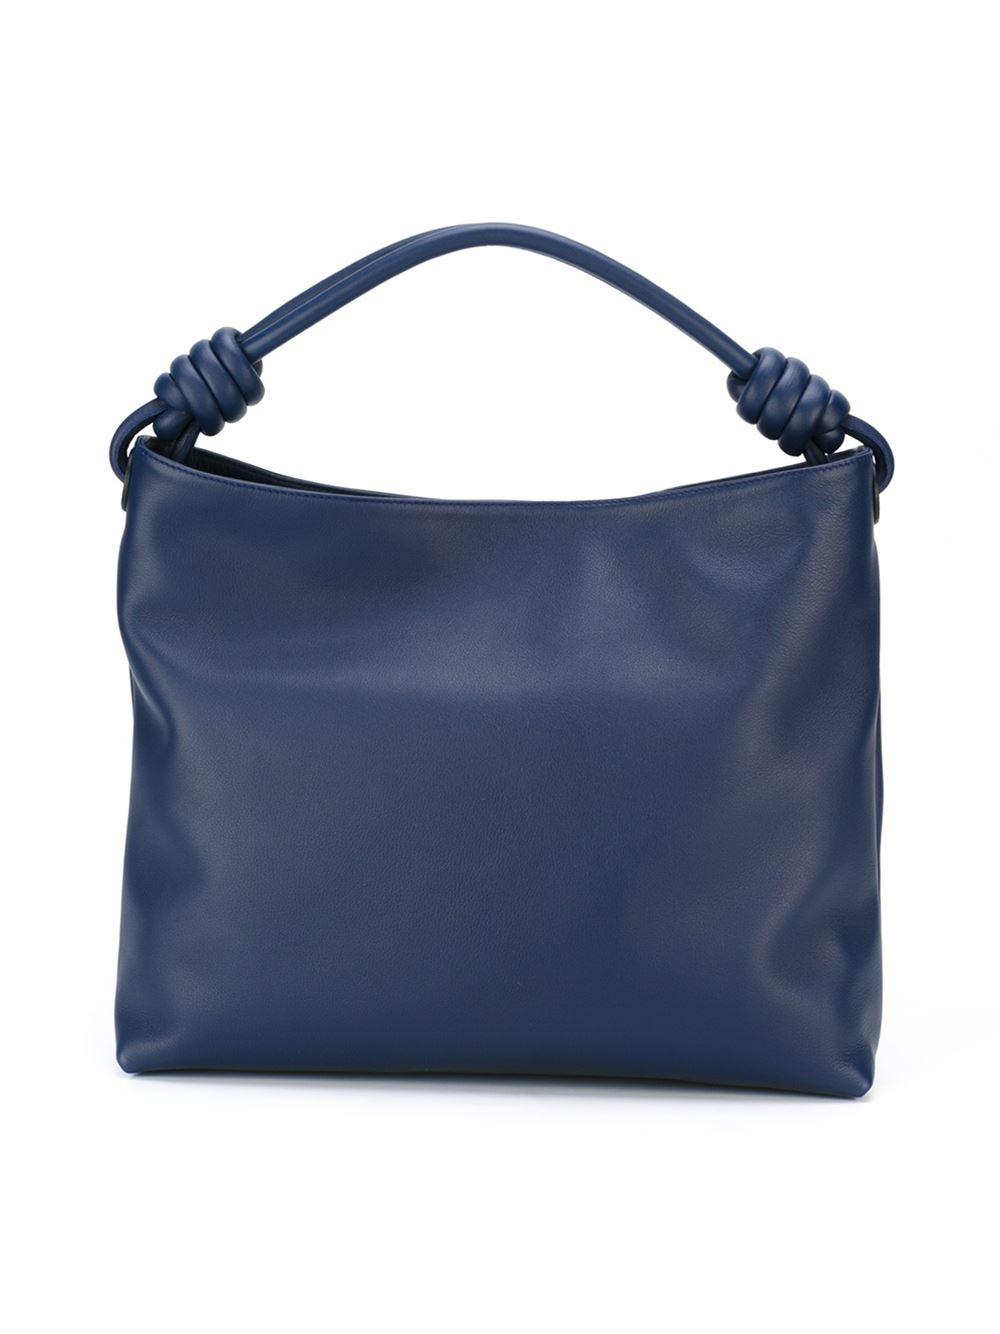 Loewe Leather Medium 'flamenco Knot' Tote in Blue